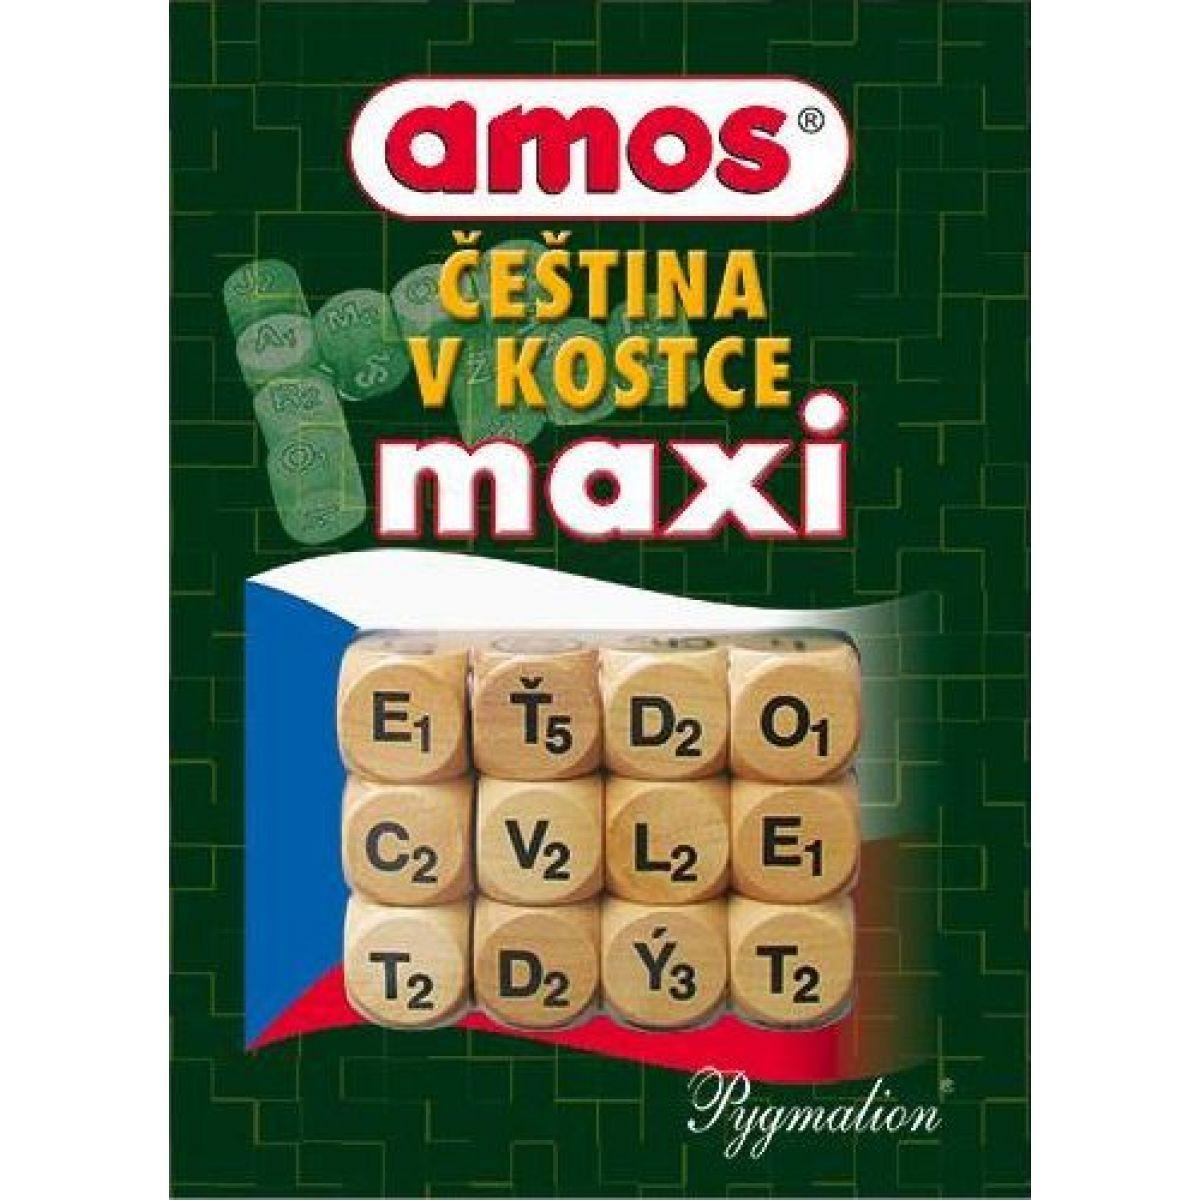 Amos Čeština v kostce Maxi